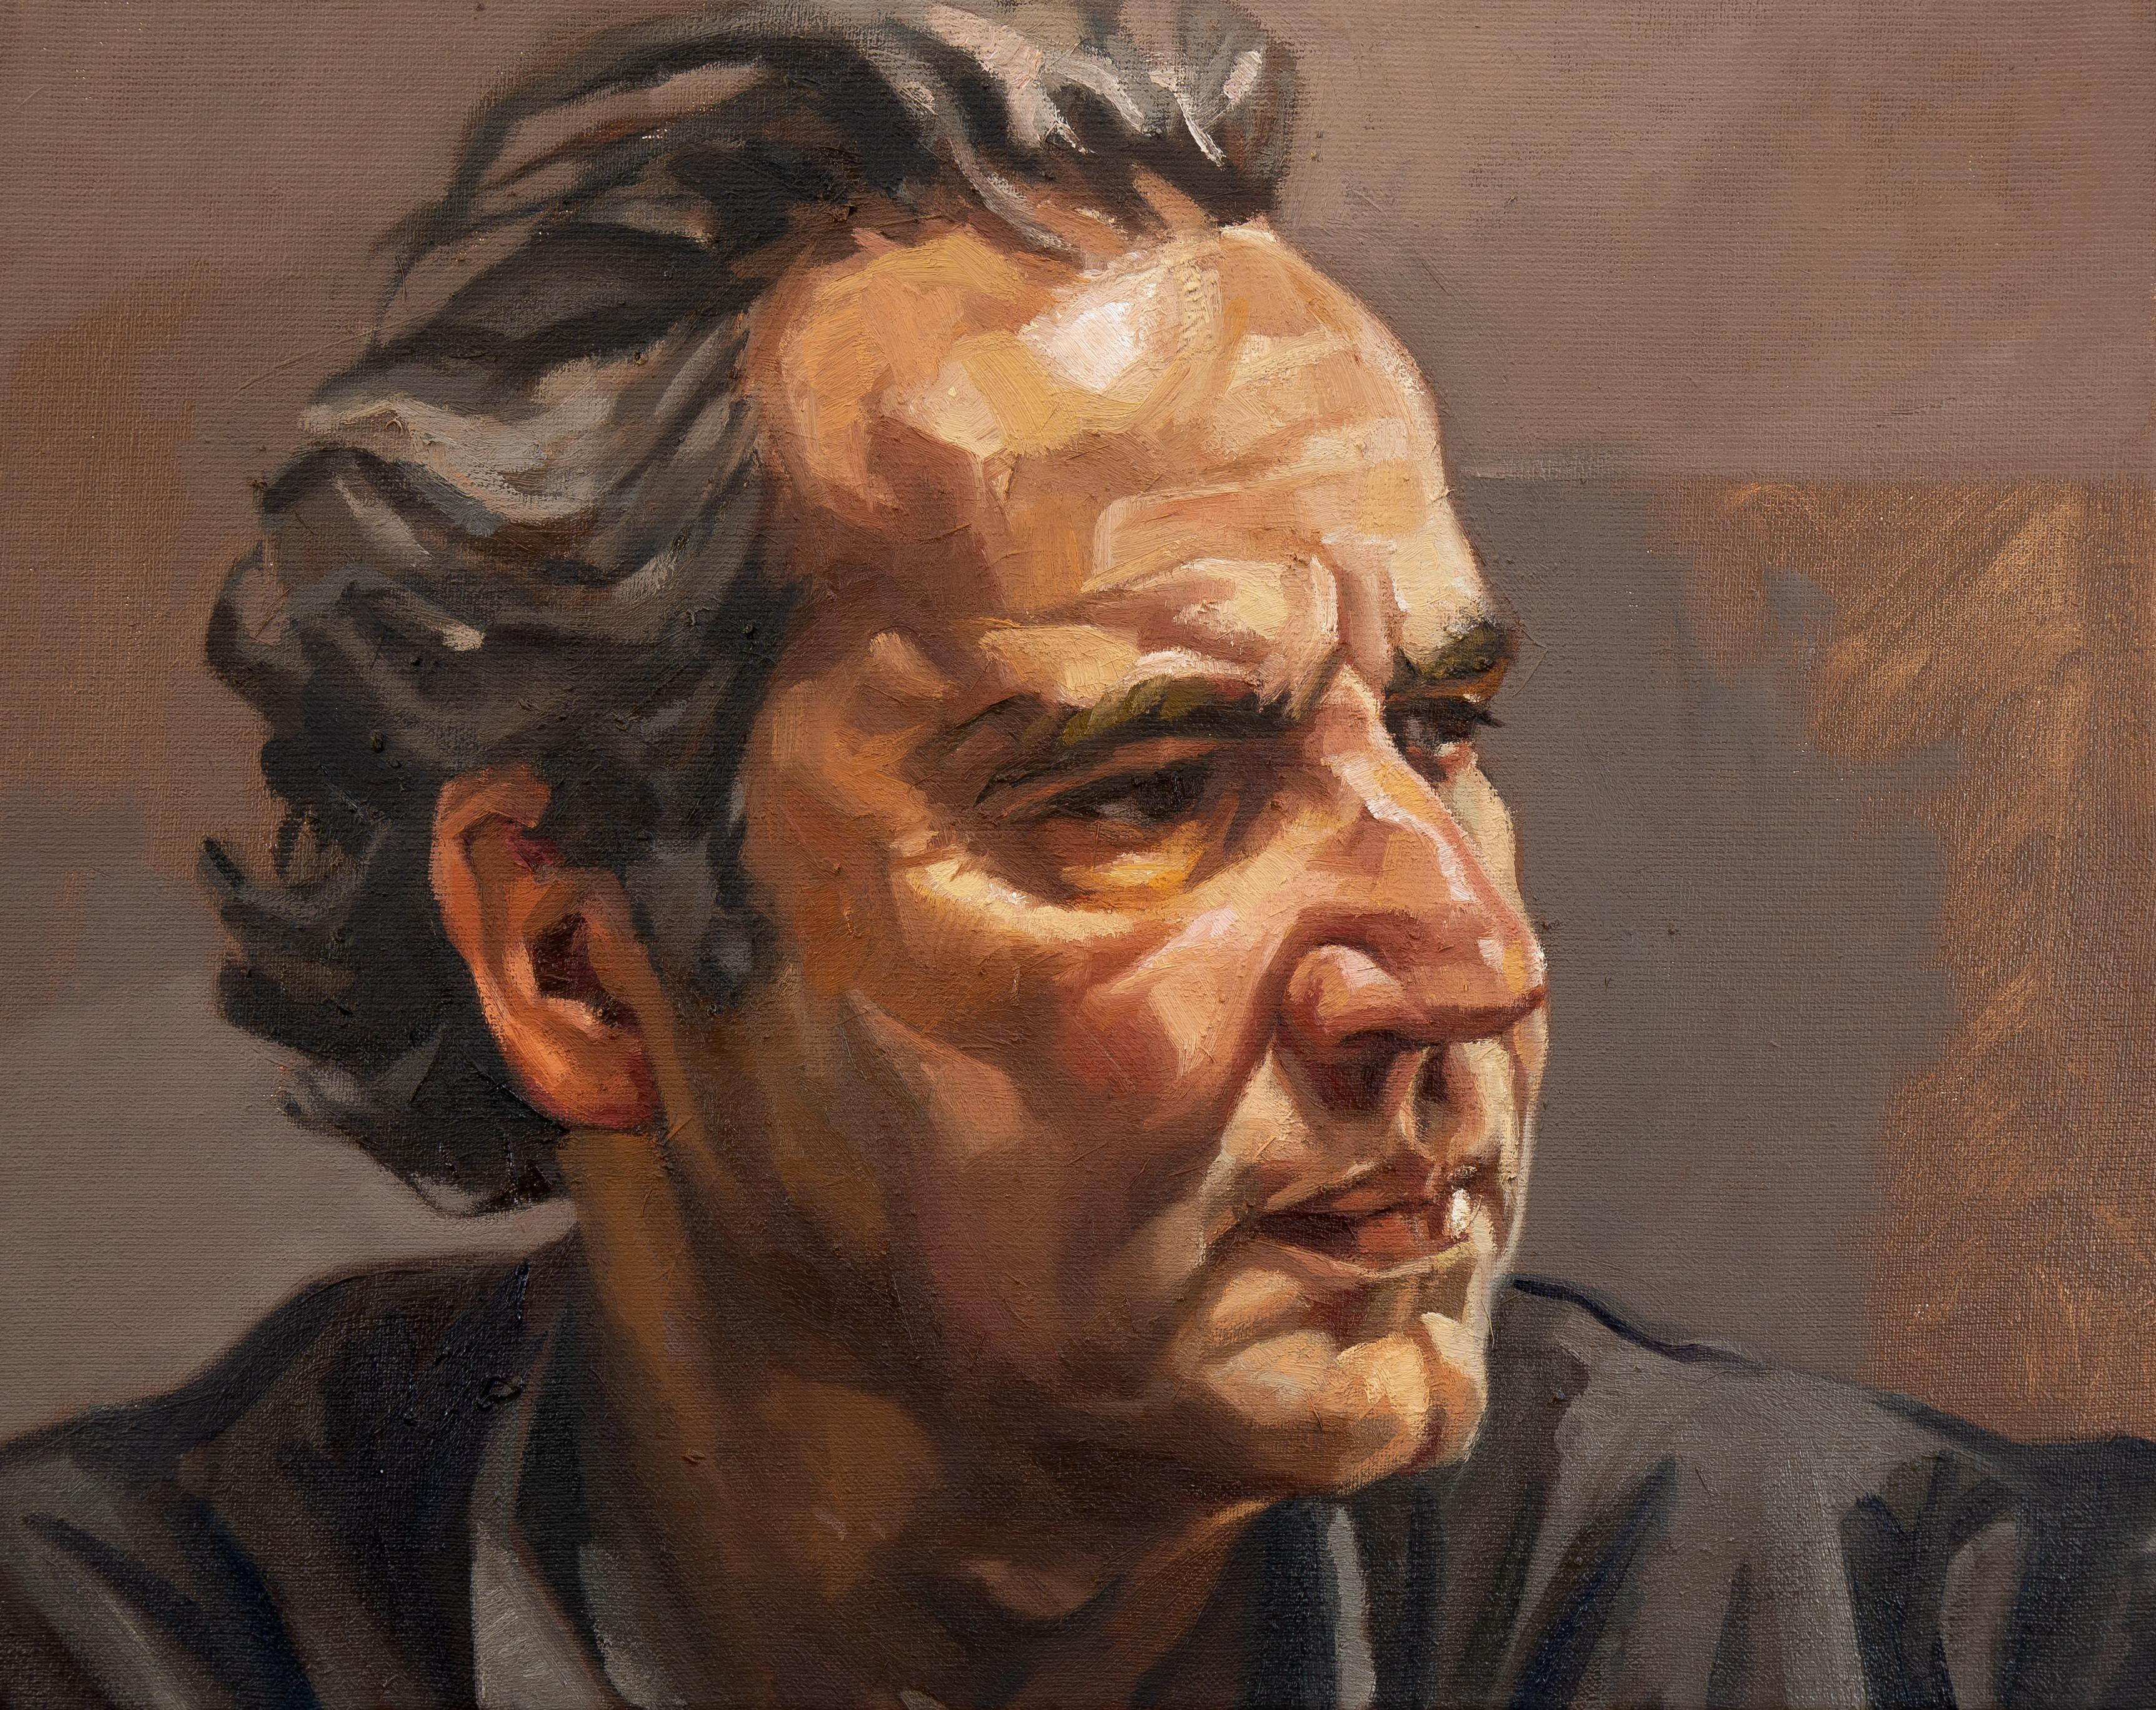 Zelfportret, 50x60cm, 2020